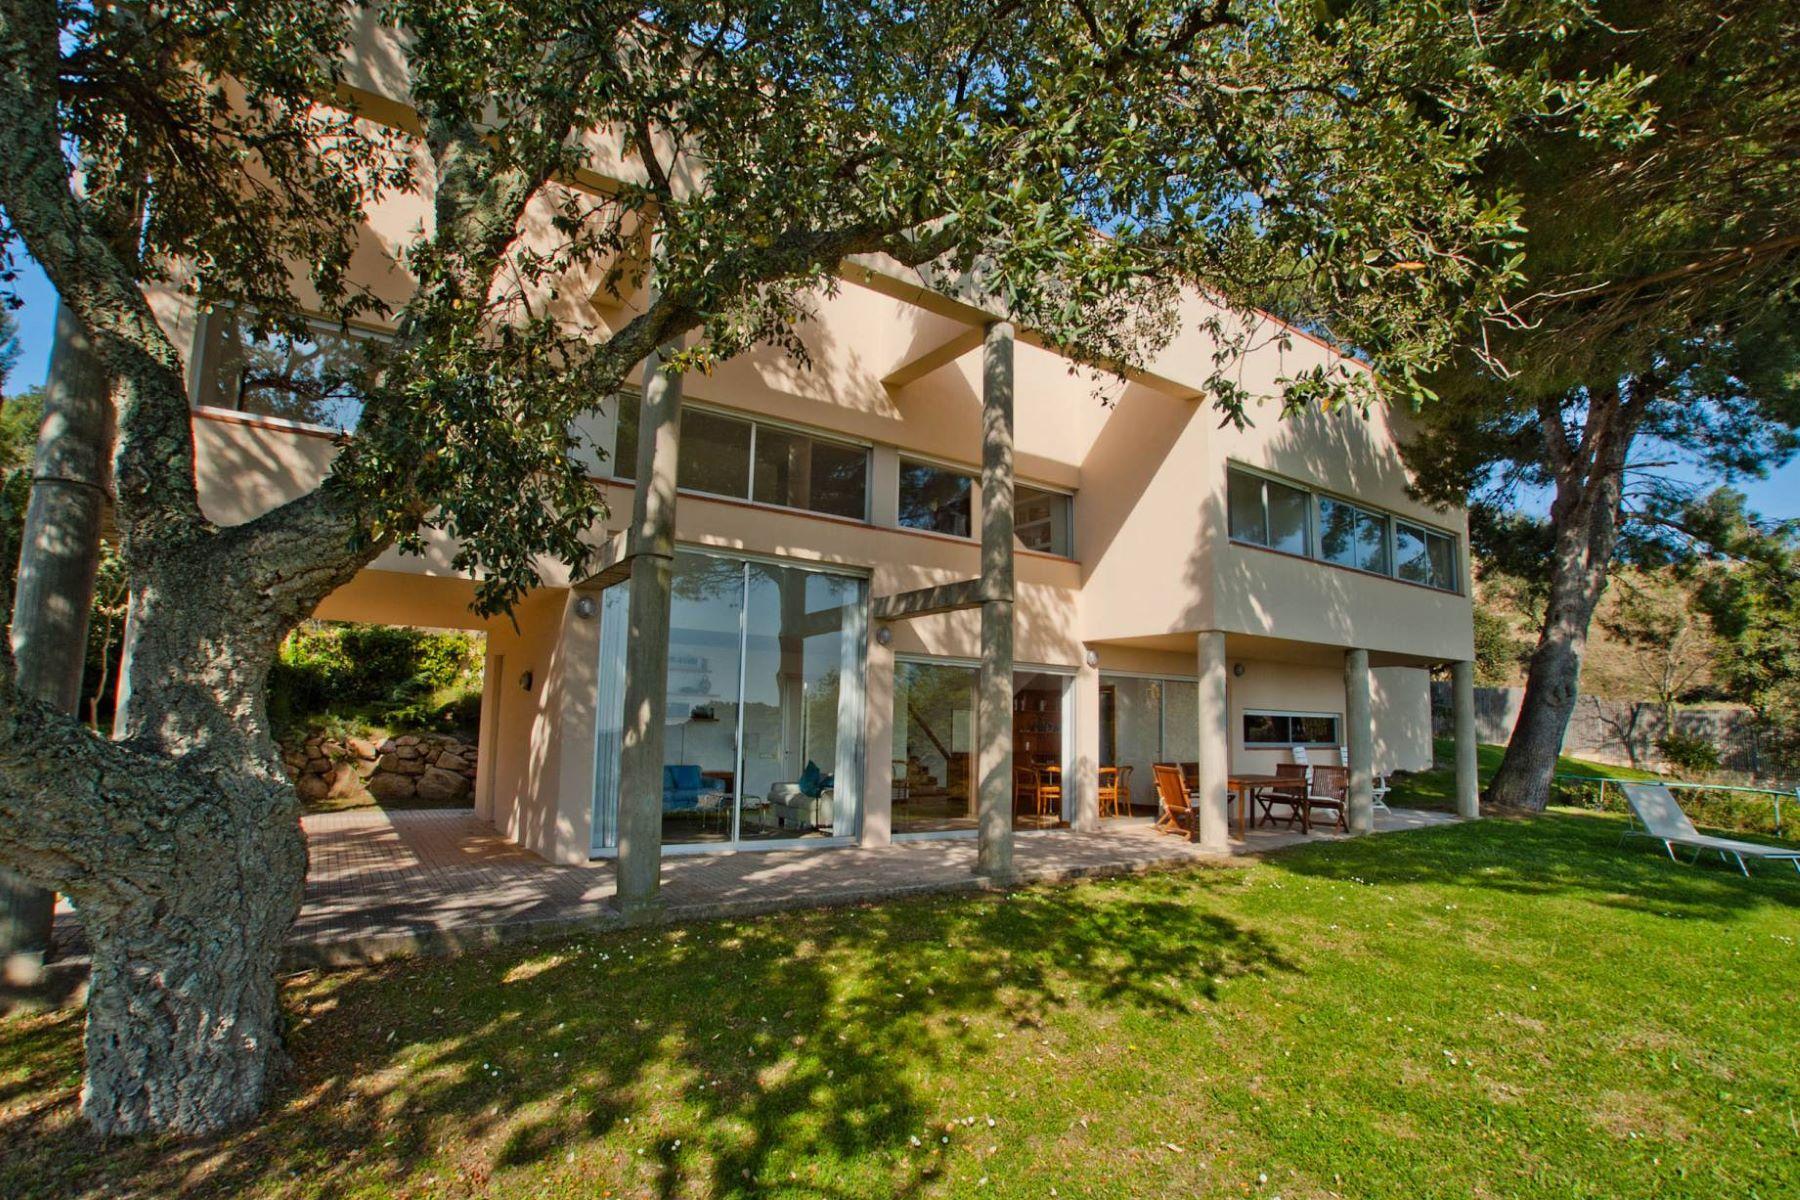 Single Family Home for Sale at Avant-garde house with panoramic sea views Playa De Aro, Costa Brava, 17250 Spain